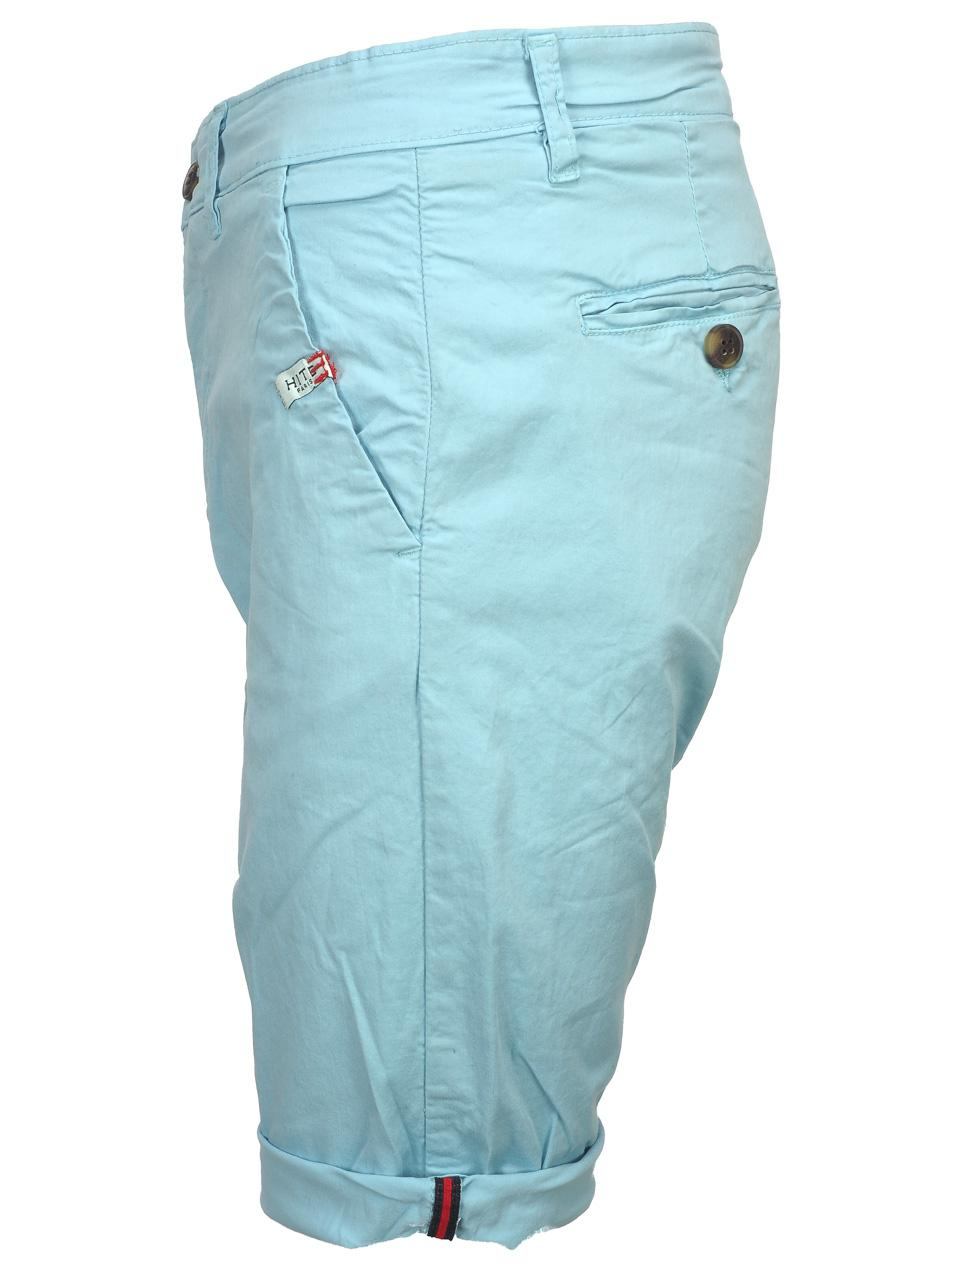 Bermuda-Shorts-Hite-Couture-Vobier-Sky-Bermuda-Chino-Blue-11597-New thumbnail 2